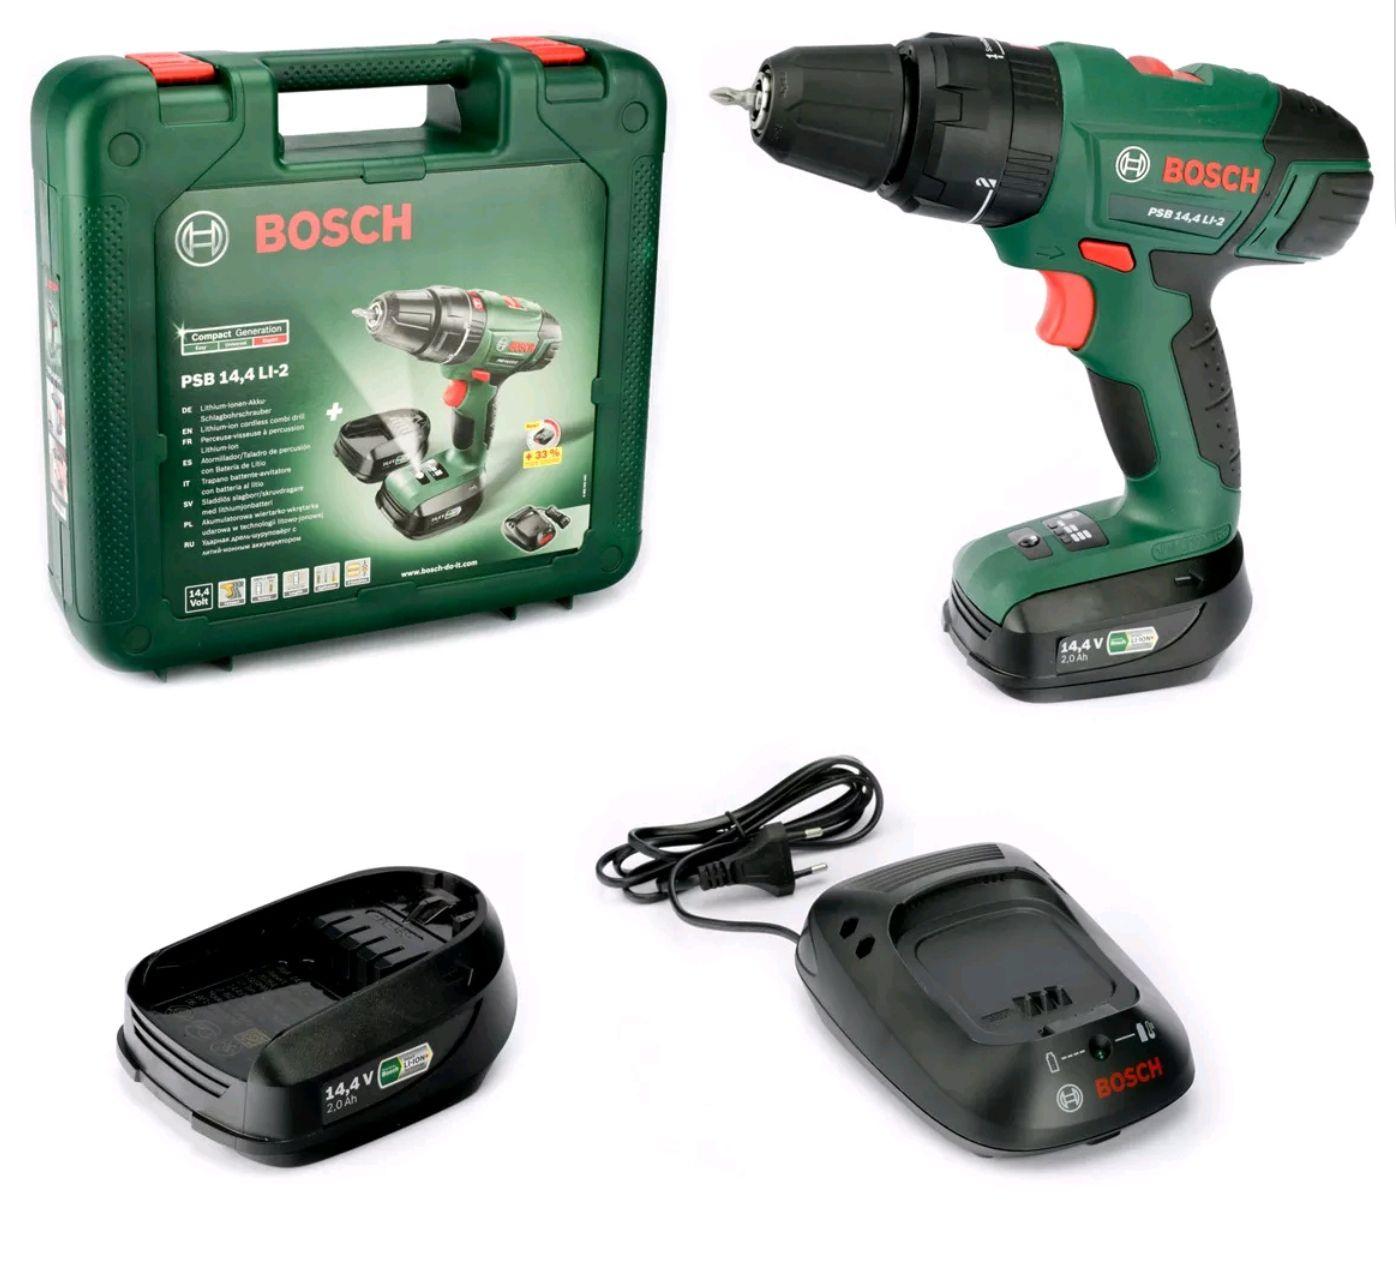 eBay: Bosch PSB 14,4 LI-2 Akku-Schlagbohrschrauber 14.4V inkl. 2. Akku & Koffer (Bestpreis)